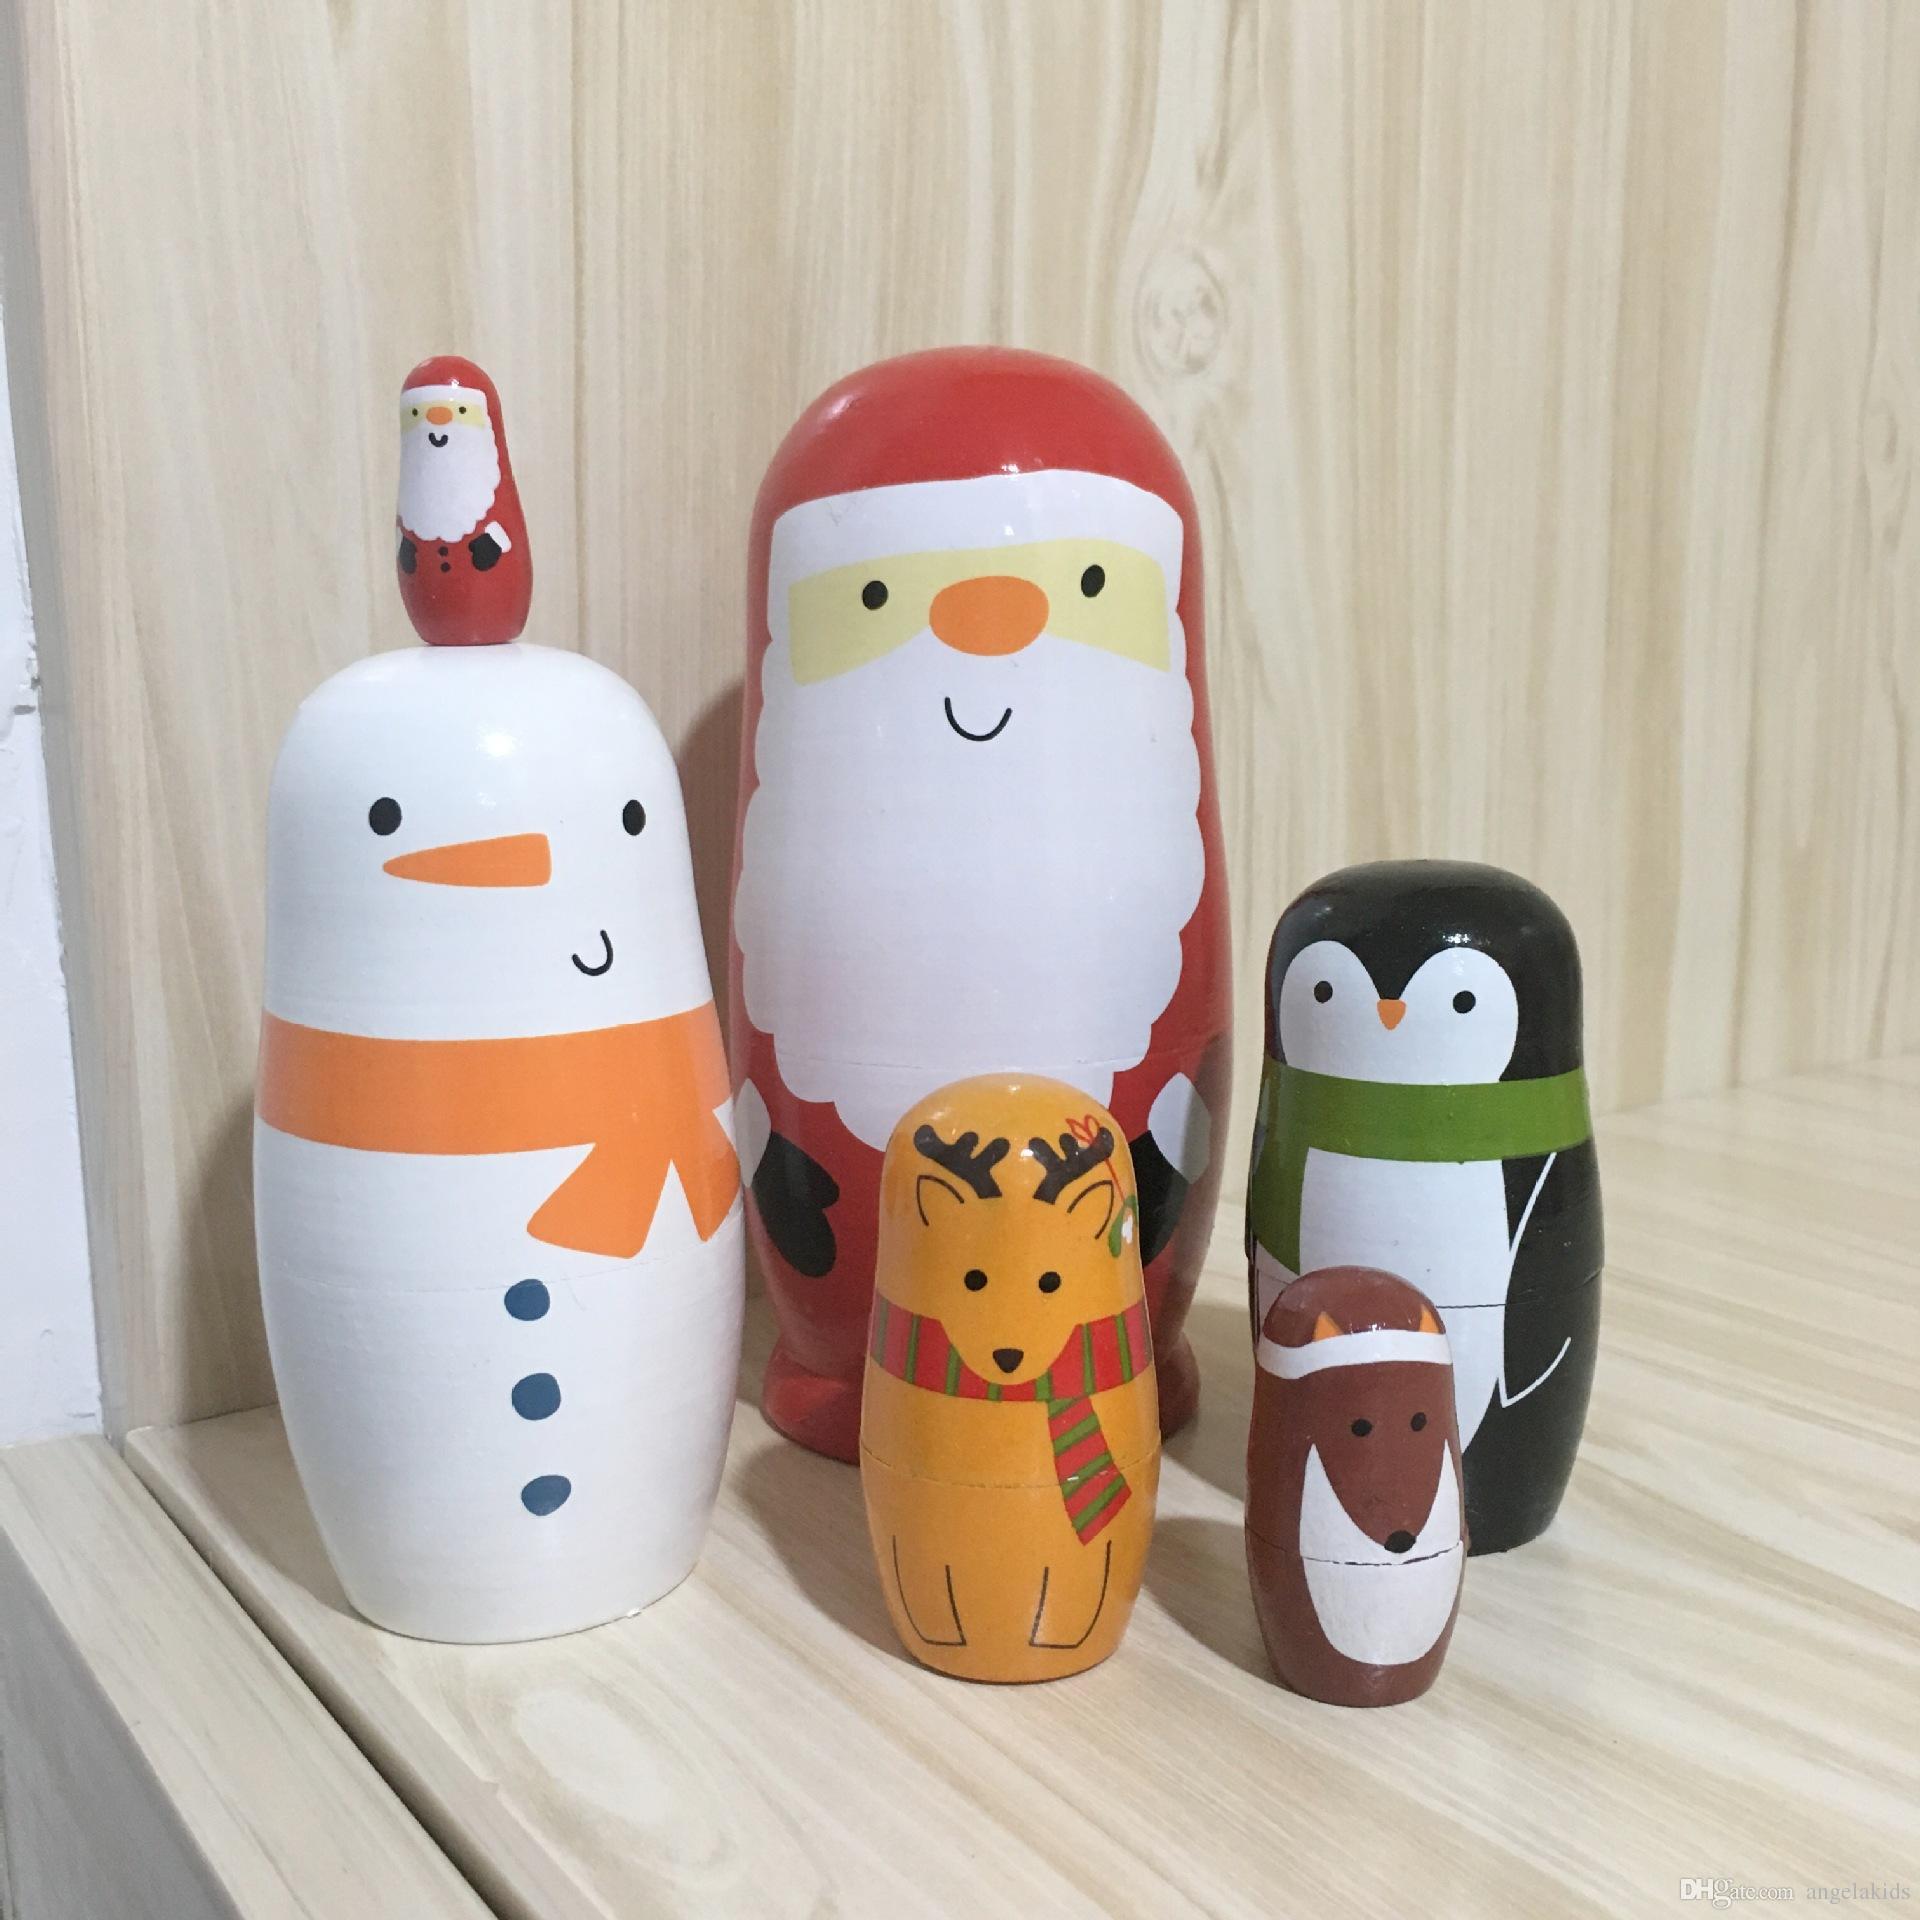 Russian Nesting Dolls Wooden Russian Nesting Dolls Matryoshka Handmade Animall Kids Toys Gift Nativity Decoration